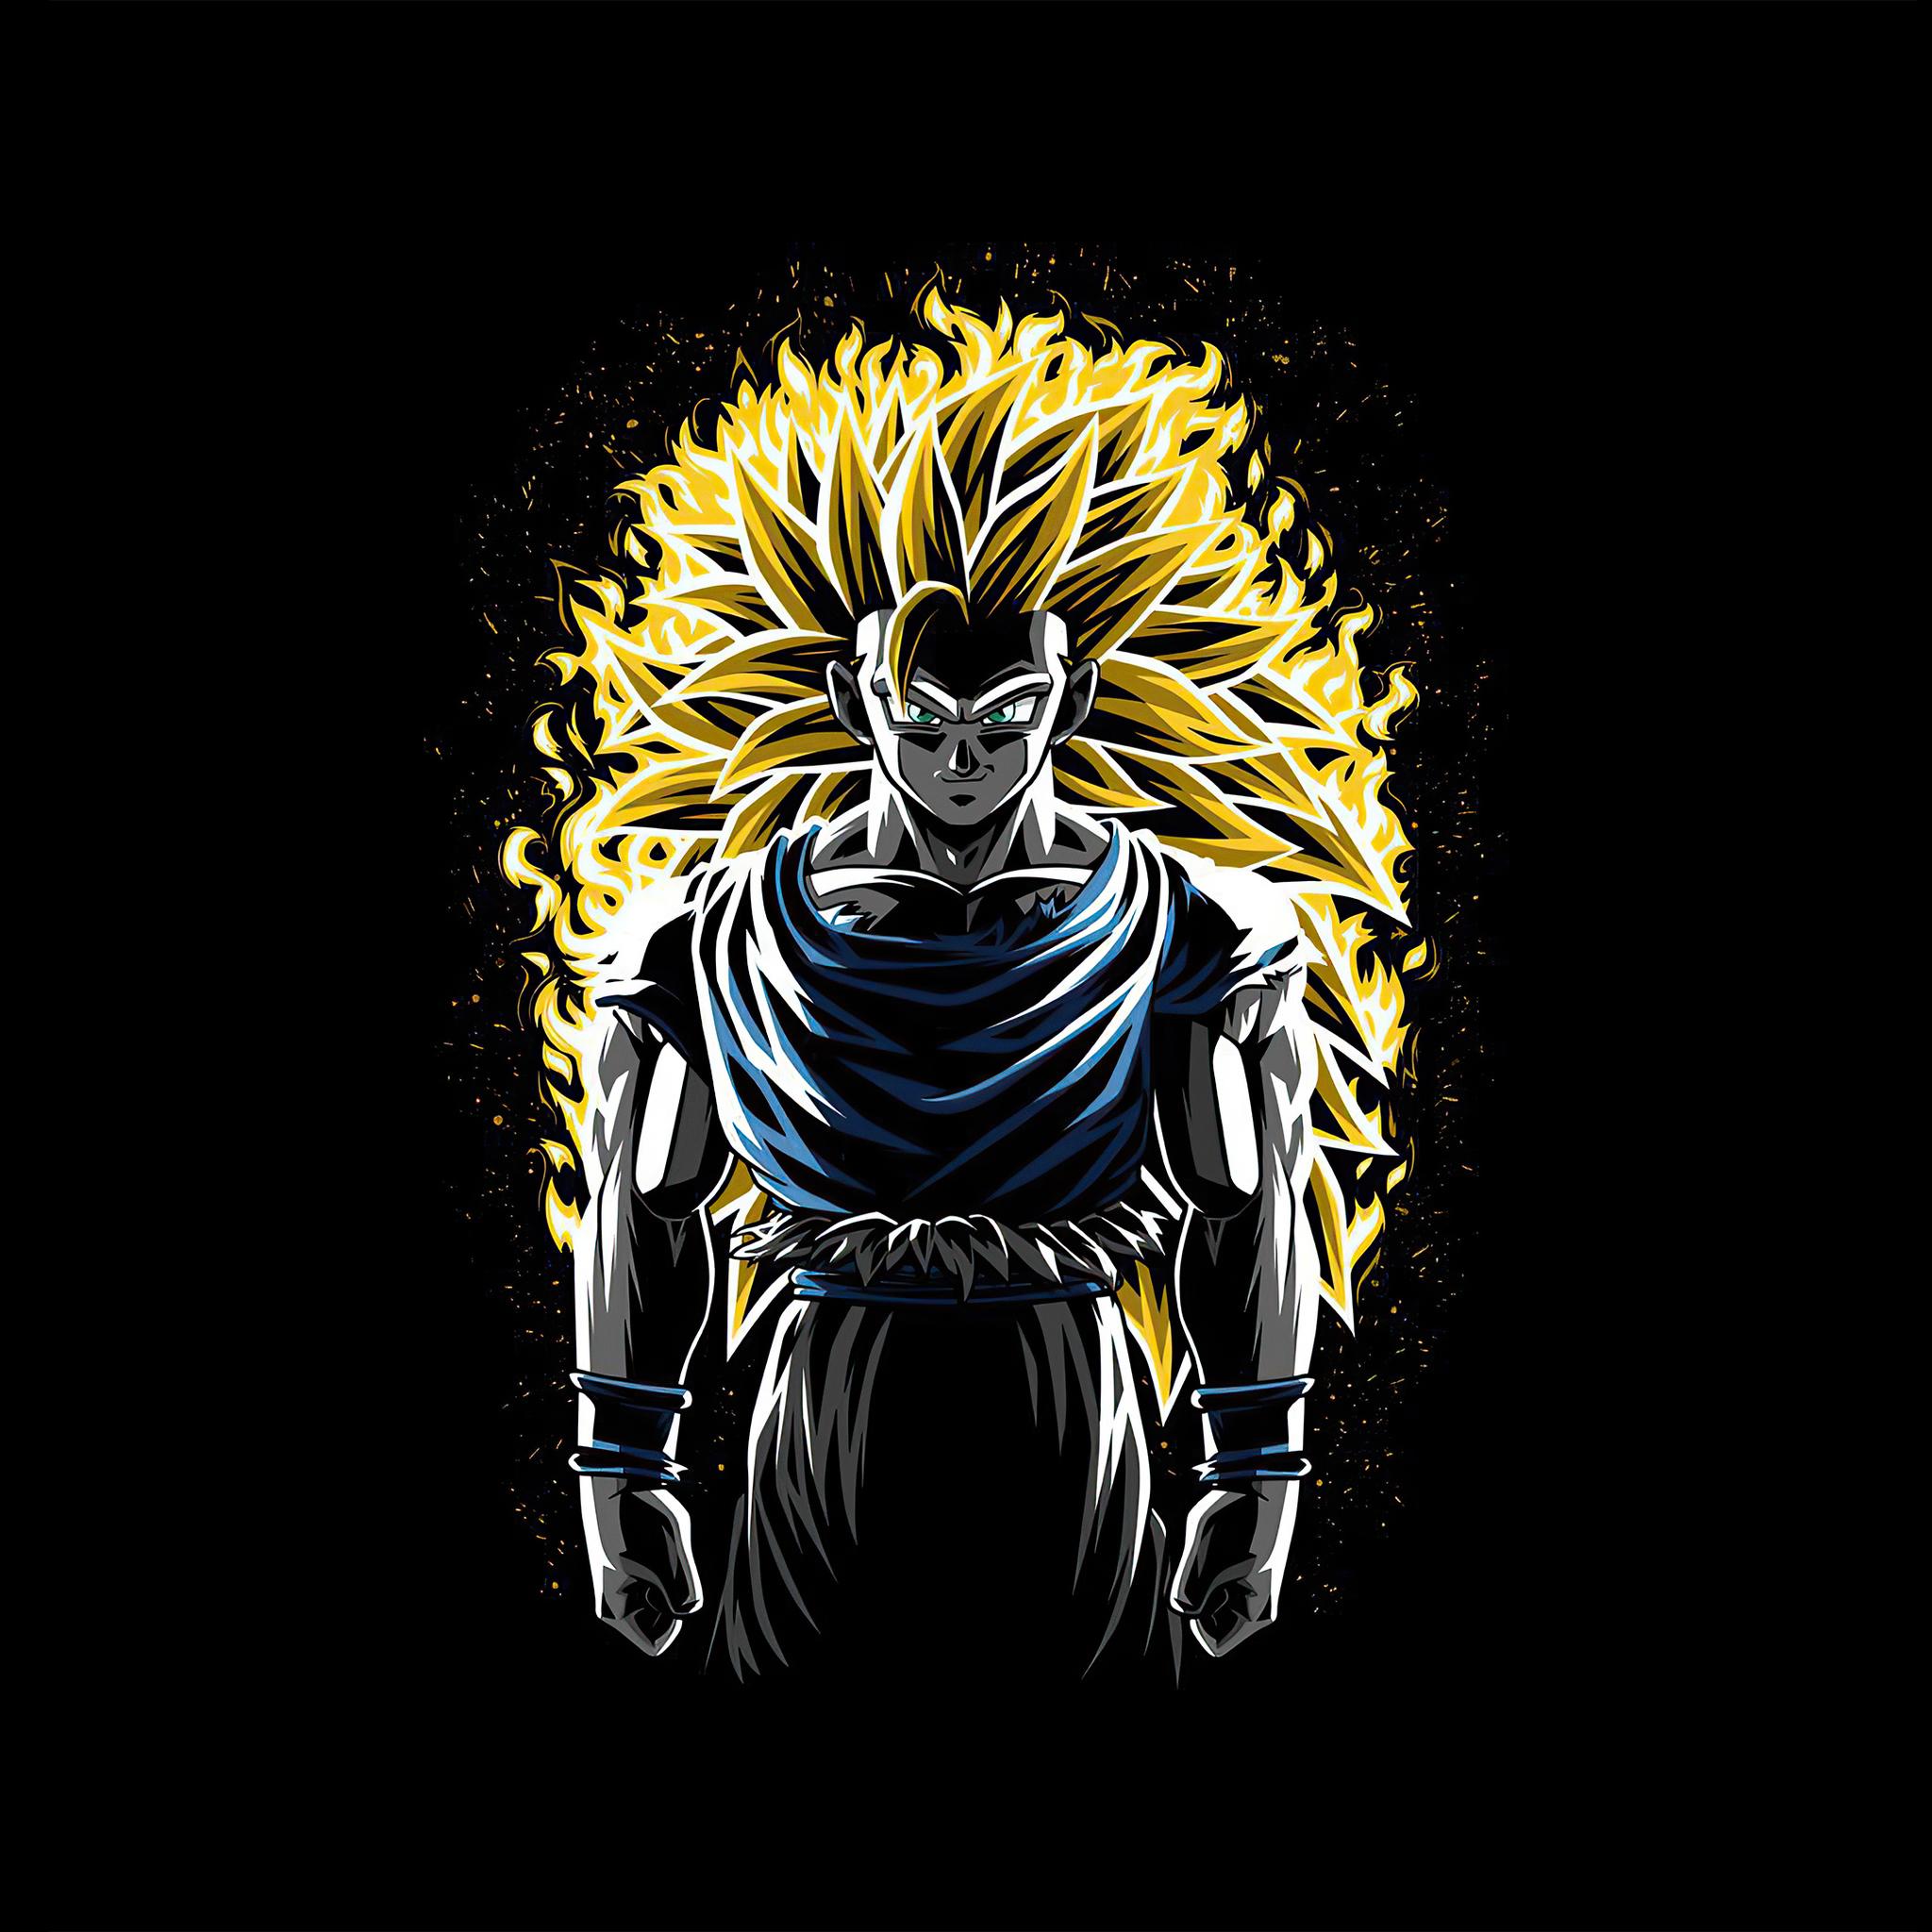 2048x2048 Battle Fire Super Saiyan 3 Goku Dragon Ball Z